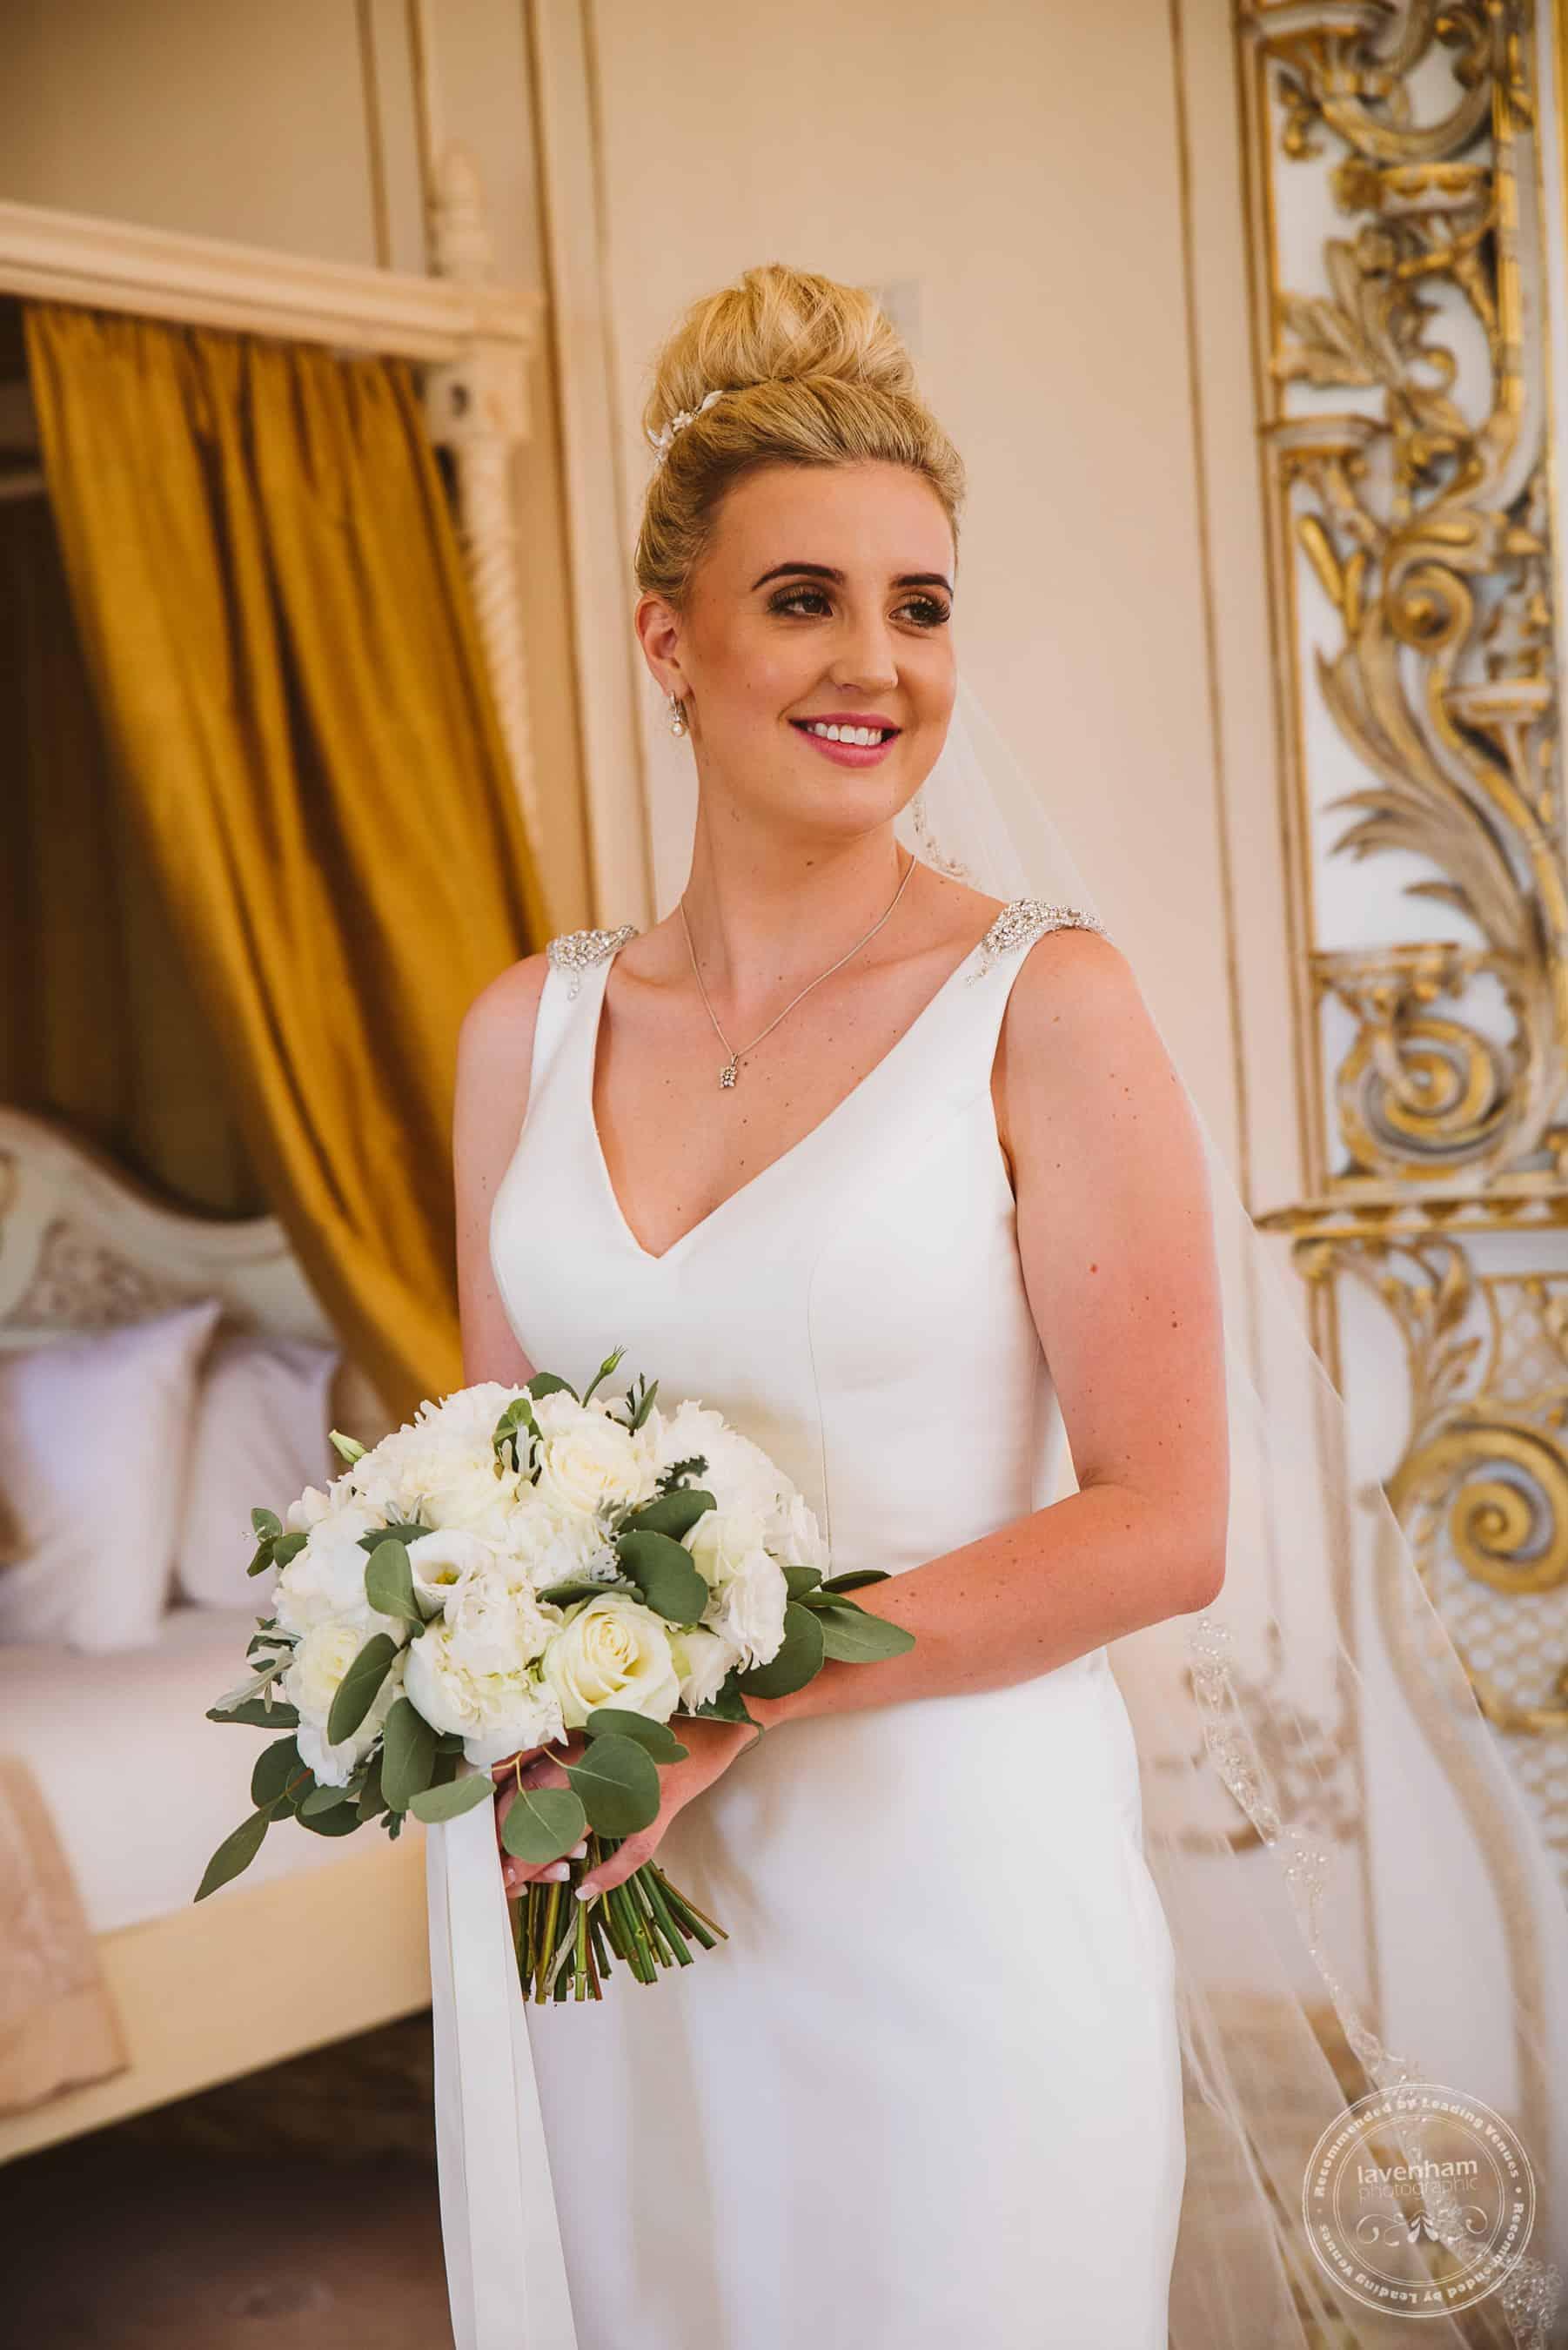 220618 Gosfield Hall Wedding Photography Lavenham Photographic 0024